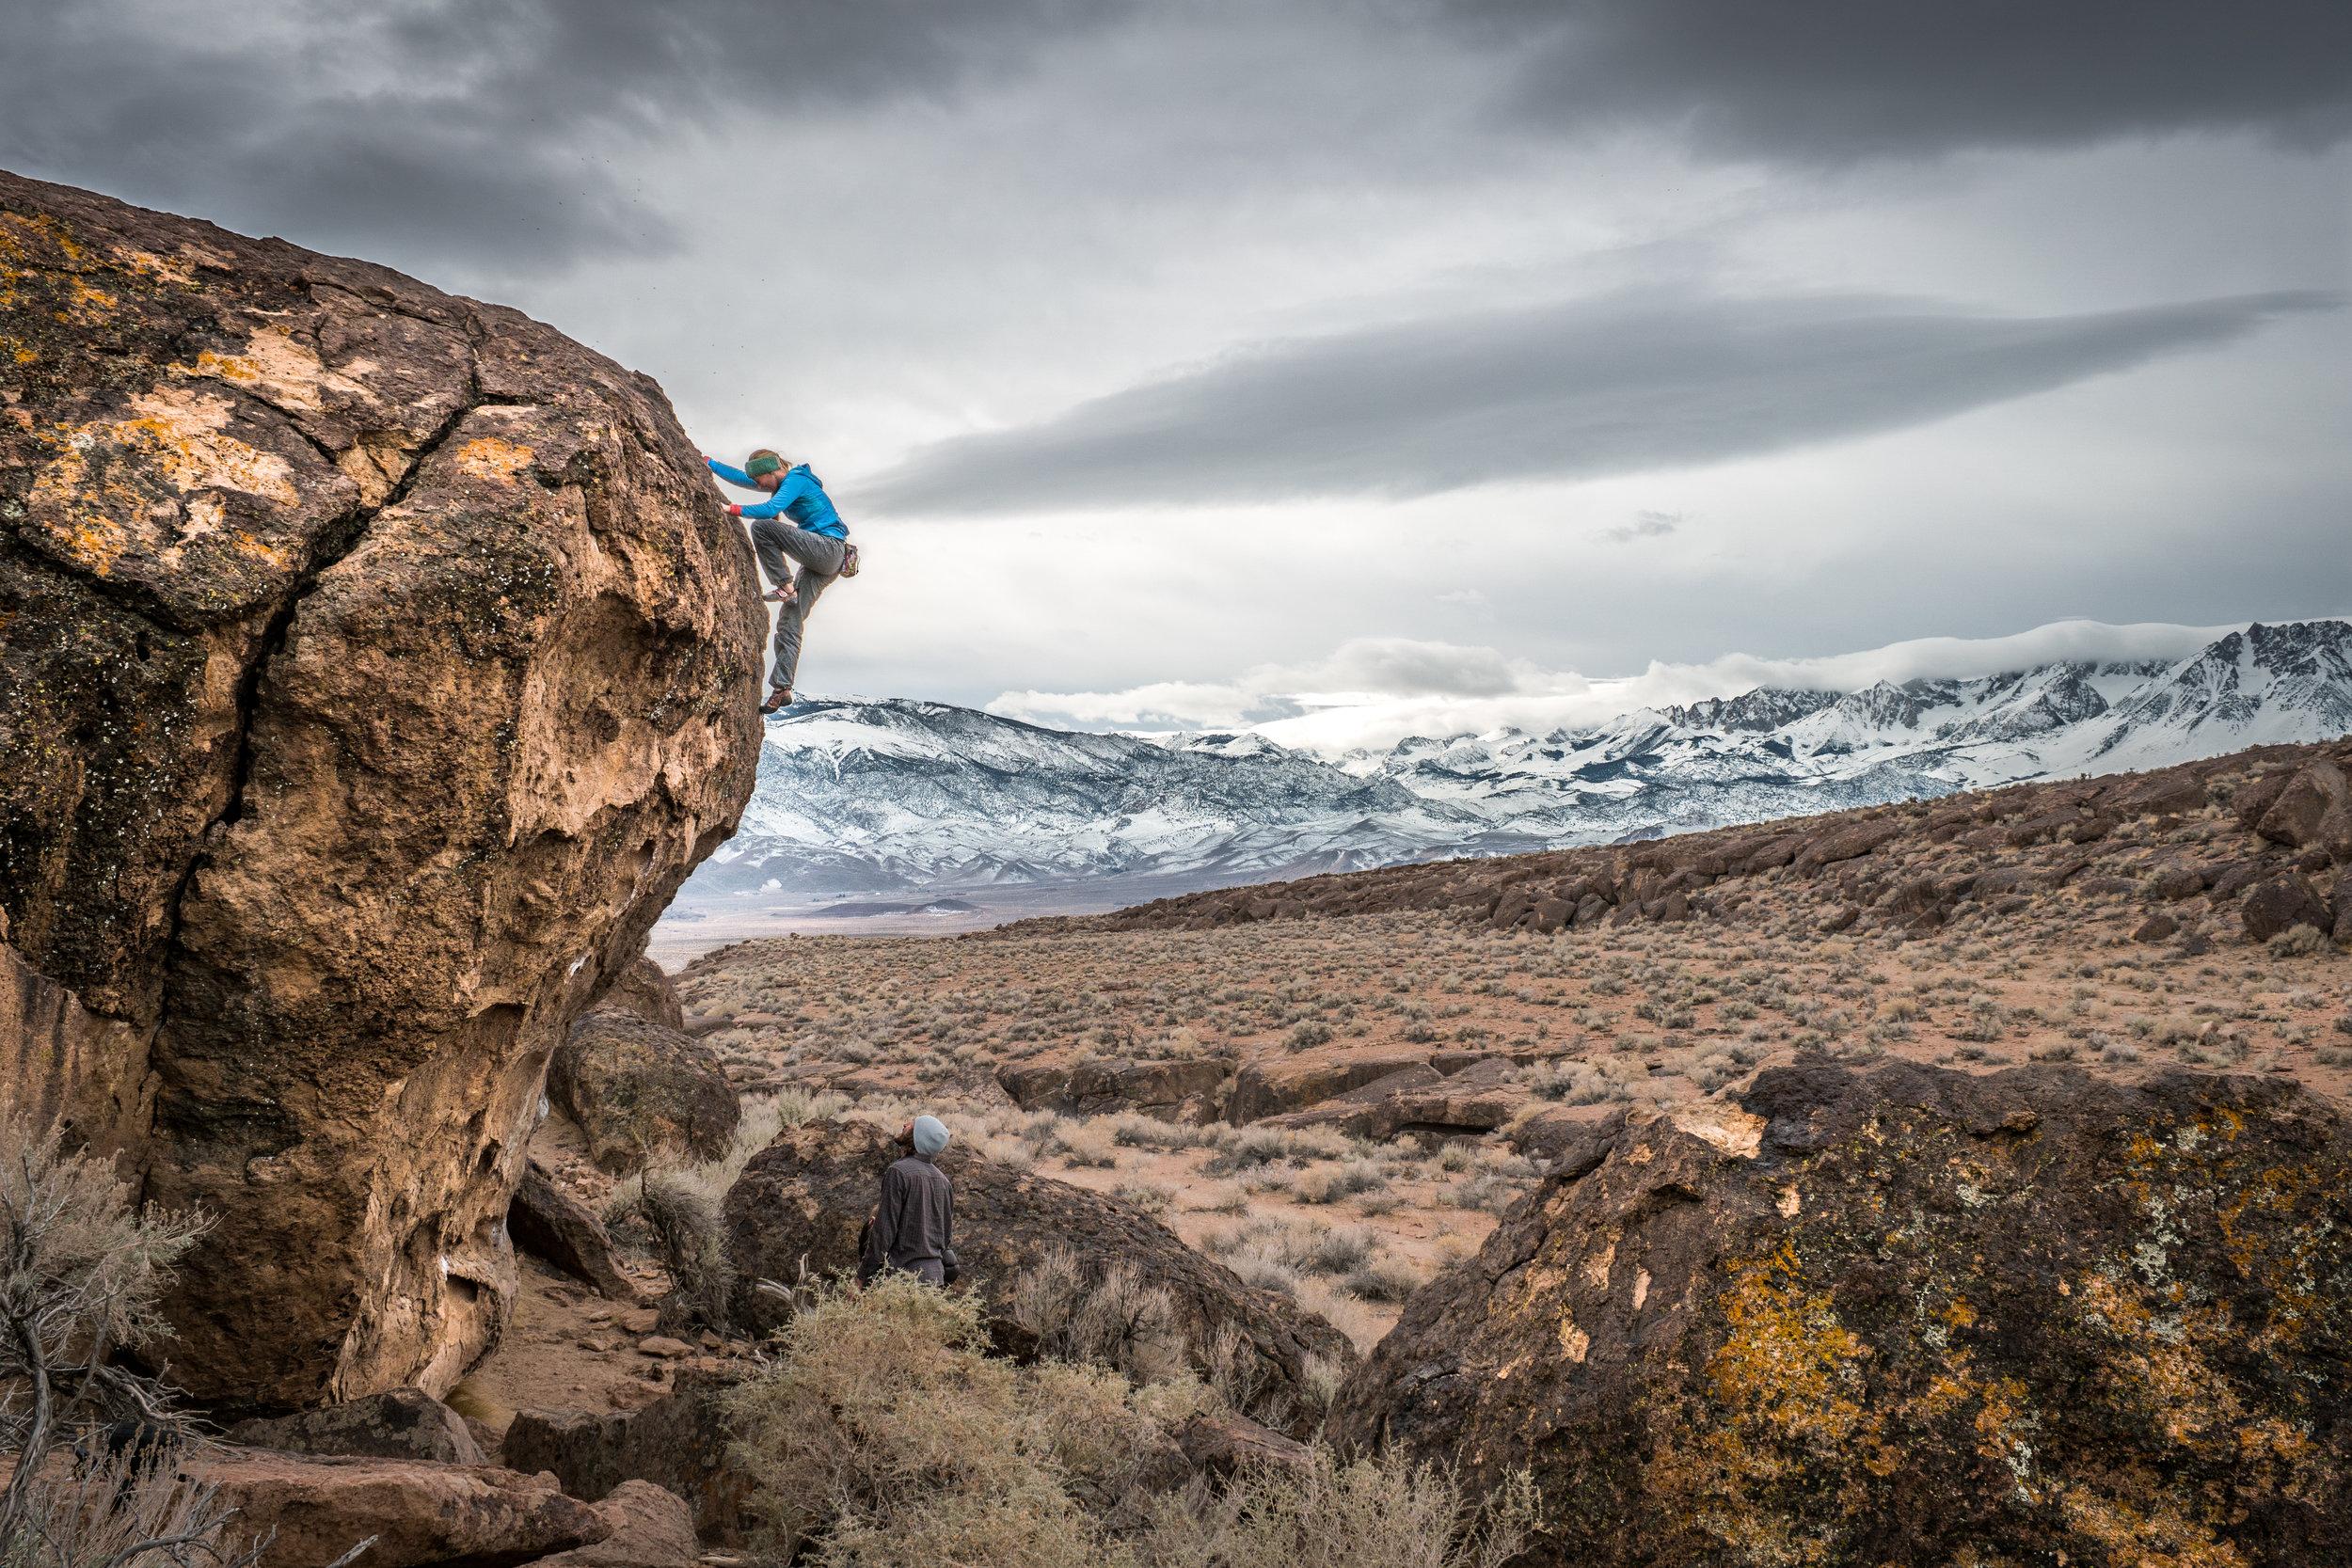 Monkeying around in Bishop watching the storm work its way through the Sierra.